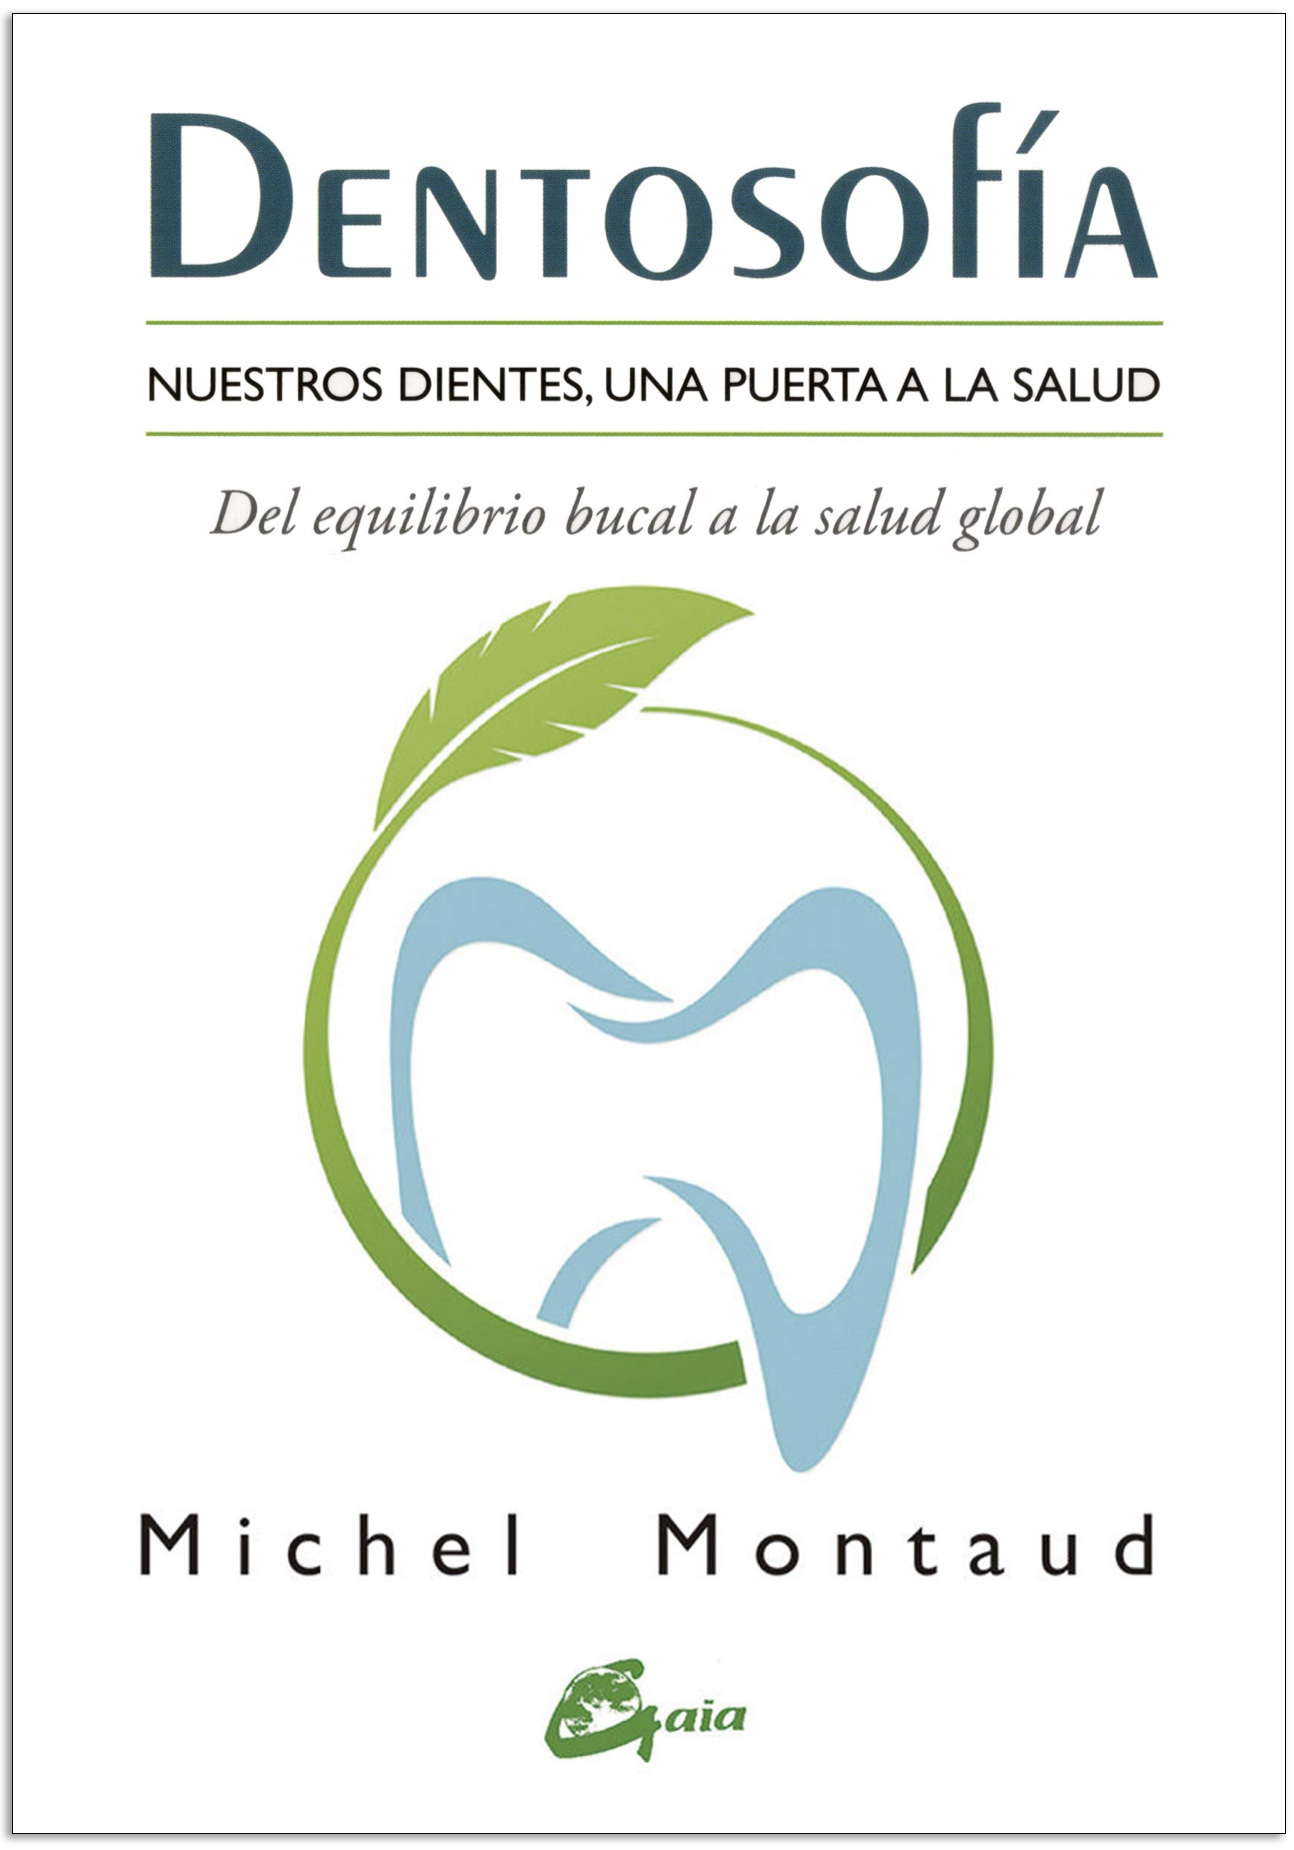 Dentosofía Madrid